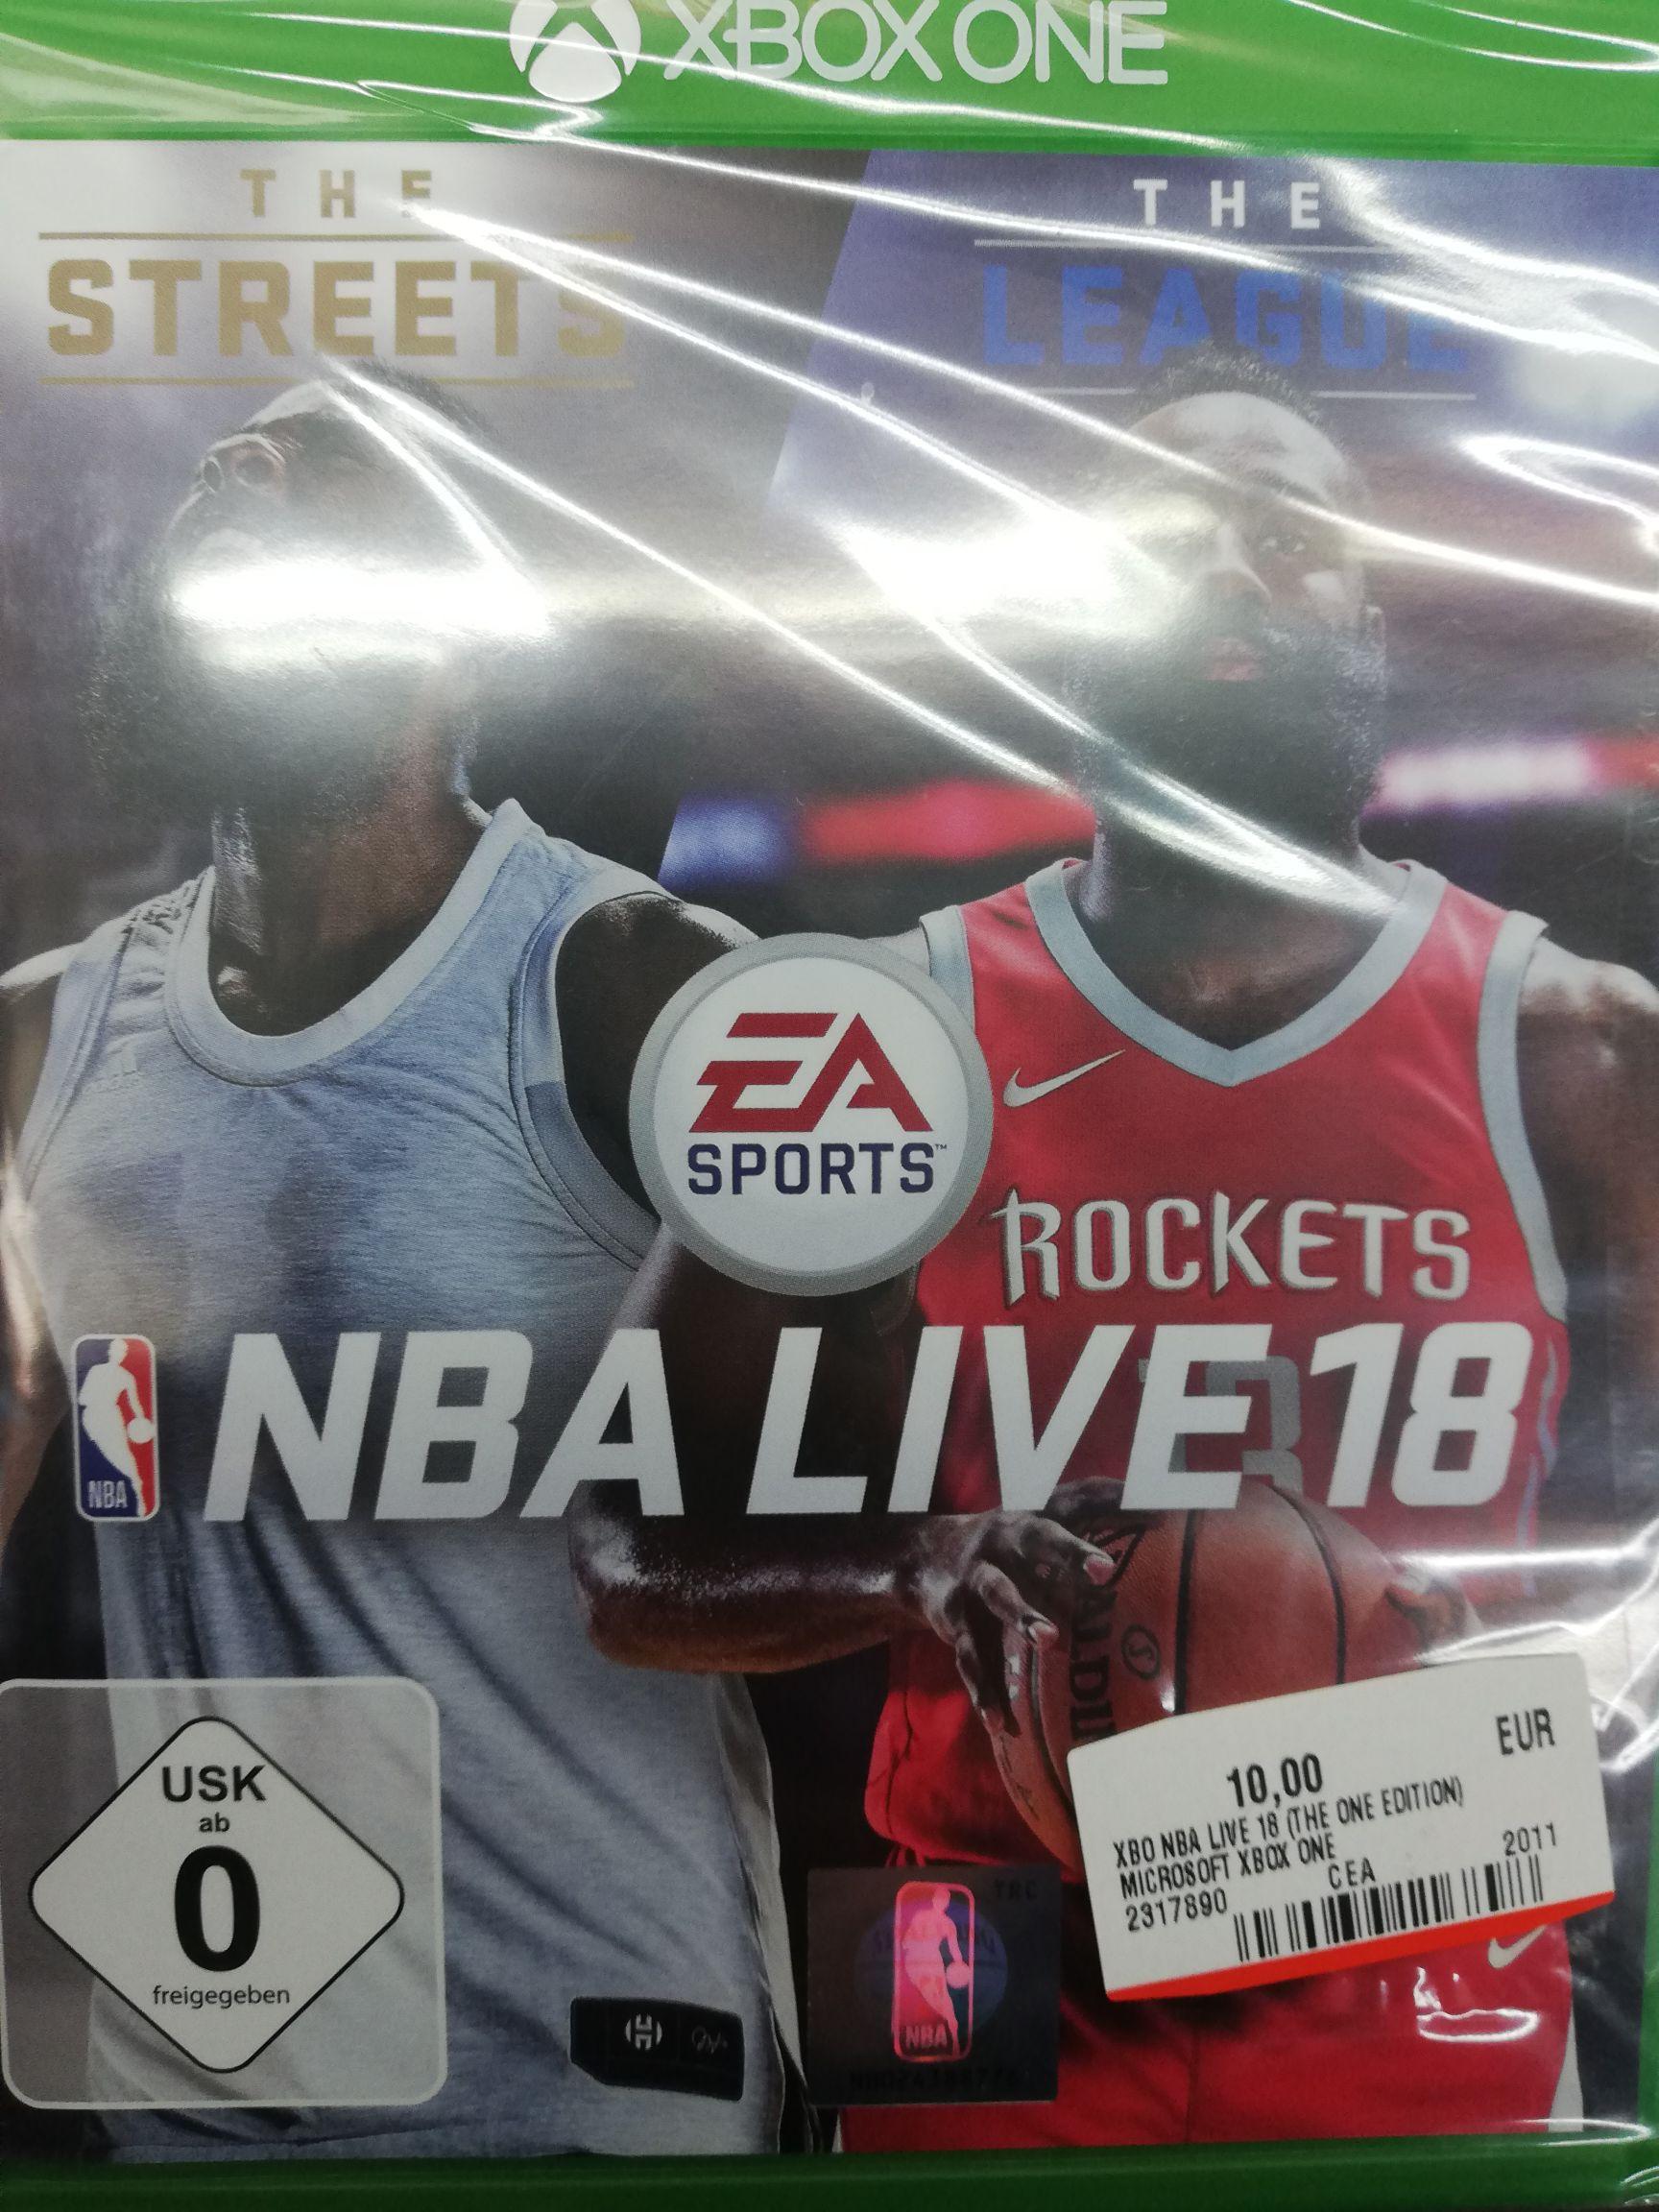 NBA Live 18 The One Edition (Xbox One) (Lokal Mediamarkt Schwedt)